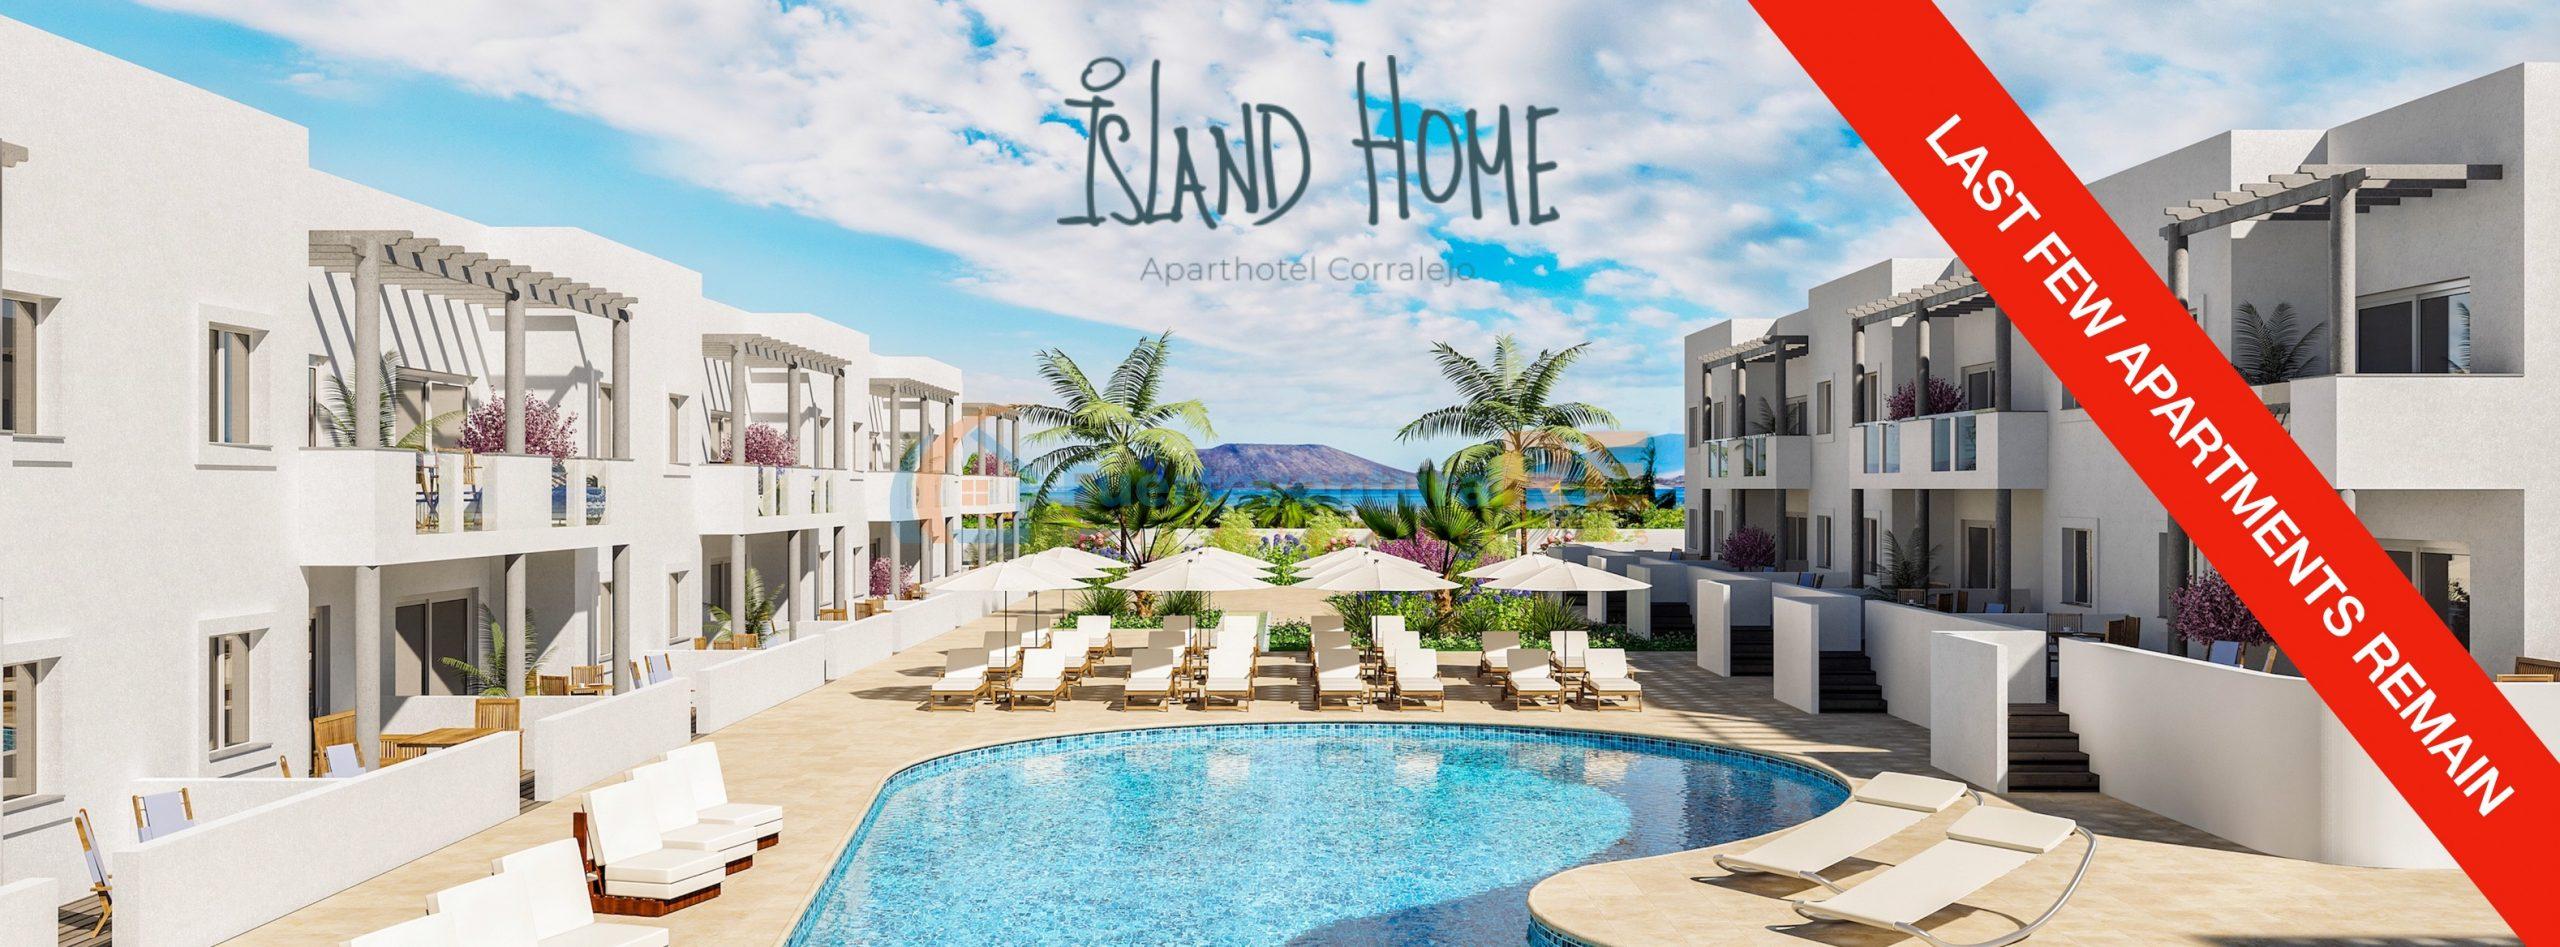 New apartments developments Corralejo Fuerteventura